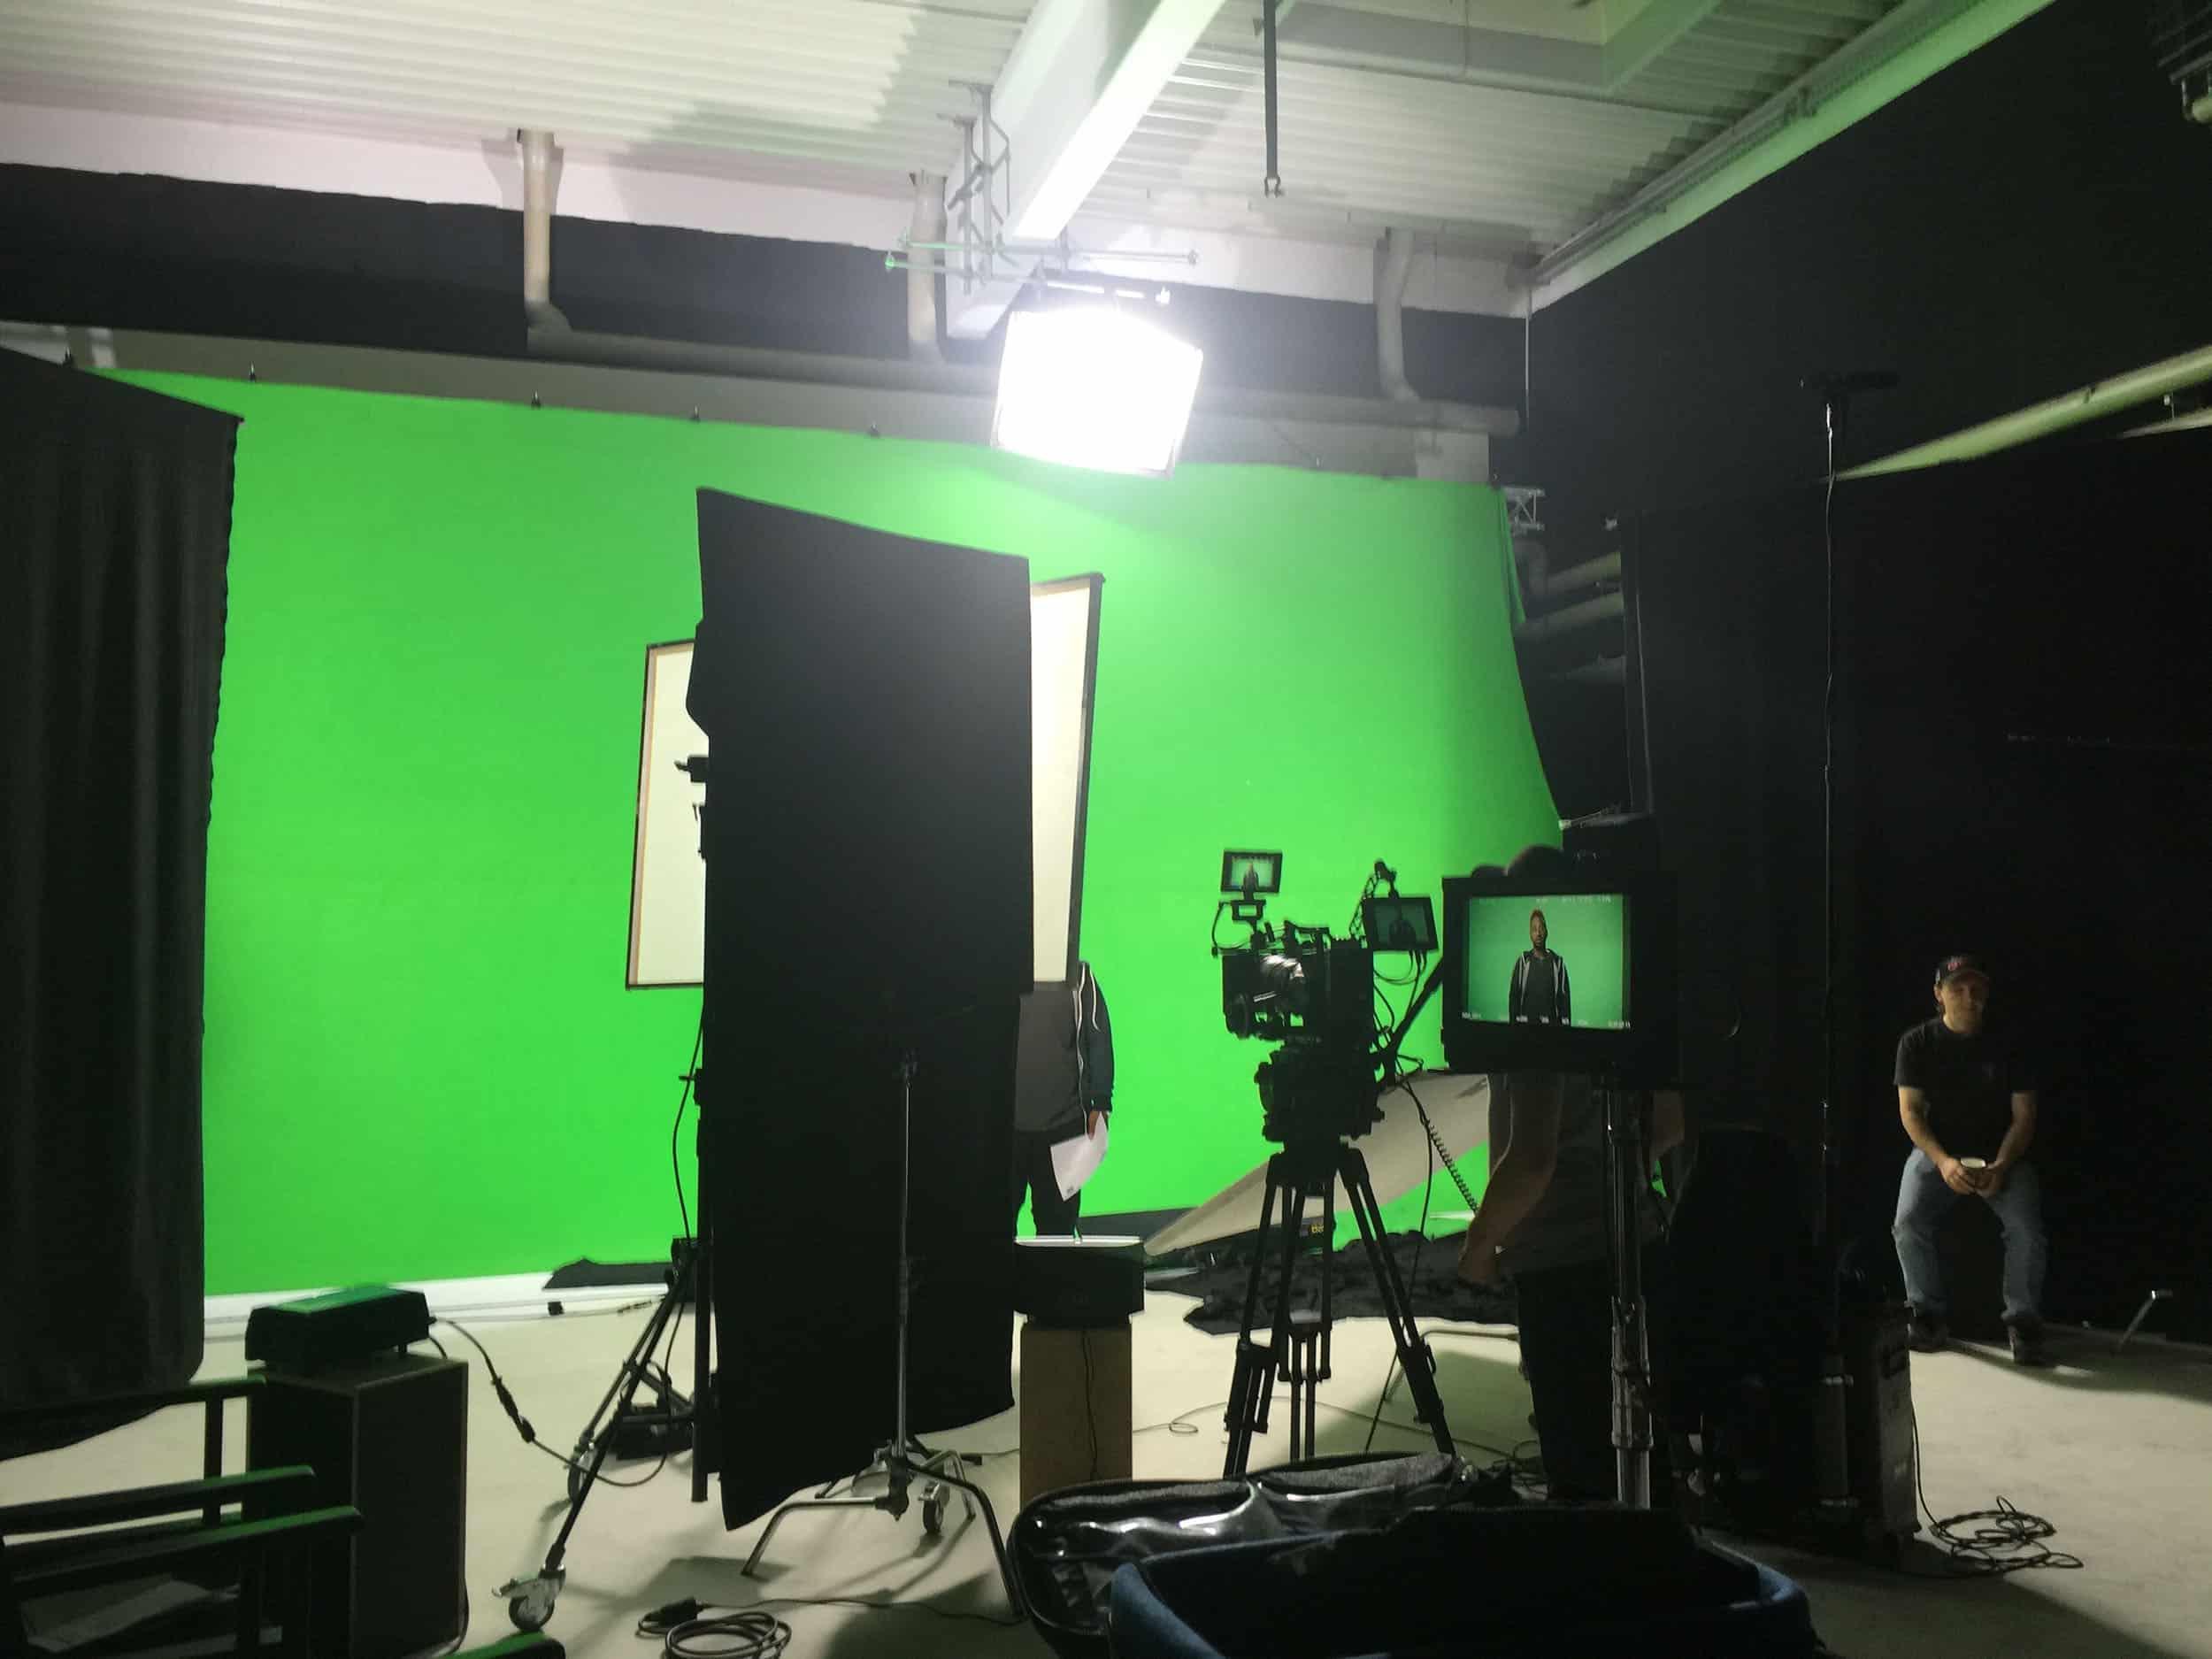 studio-ignatov-rolandversicherung-adokojo-tvcommercial-05